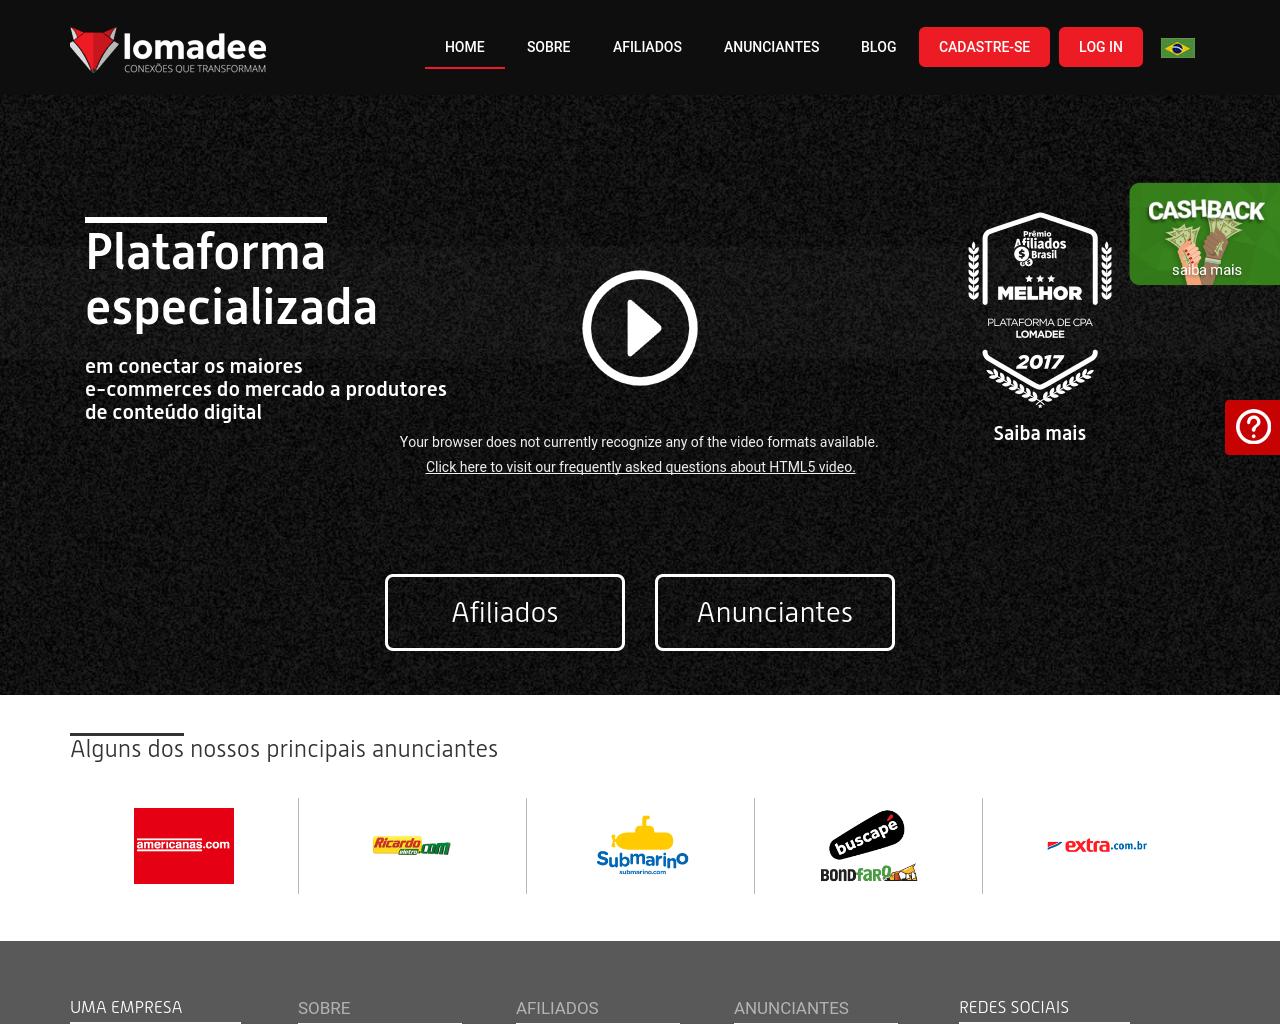 Lomadee-Advertising-Reviews-Pricing